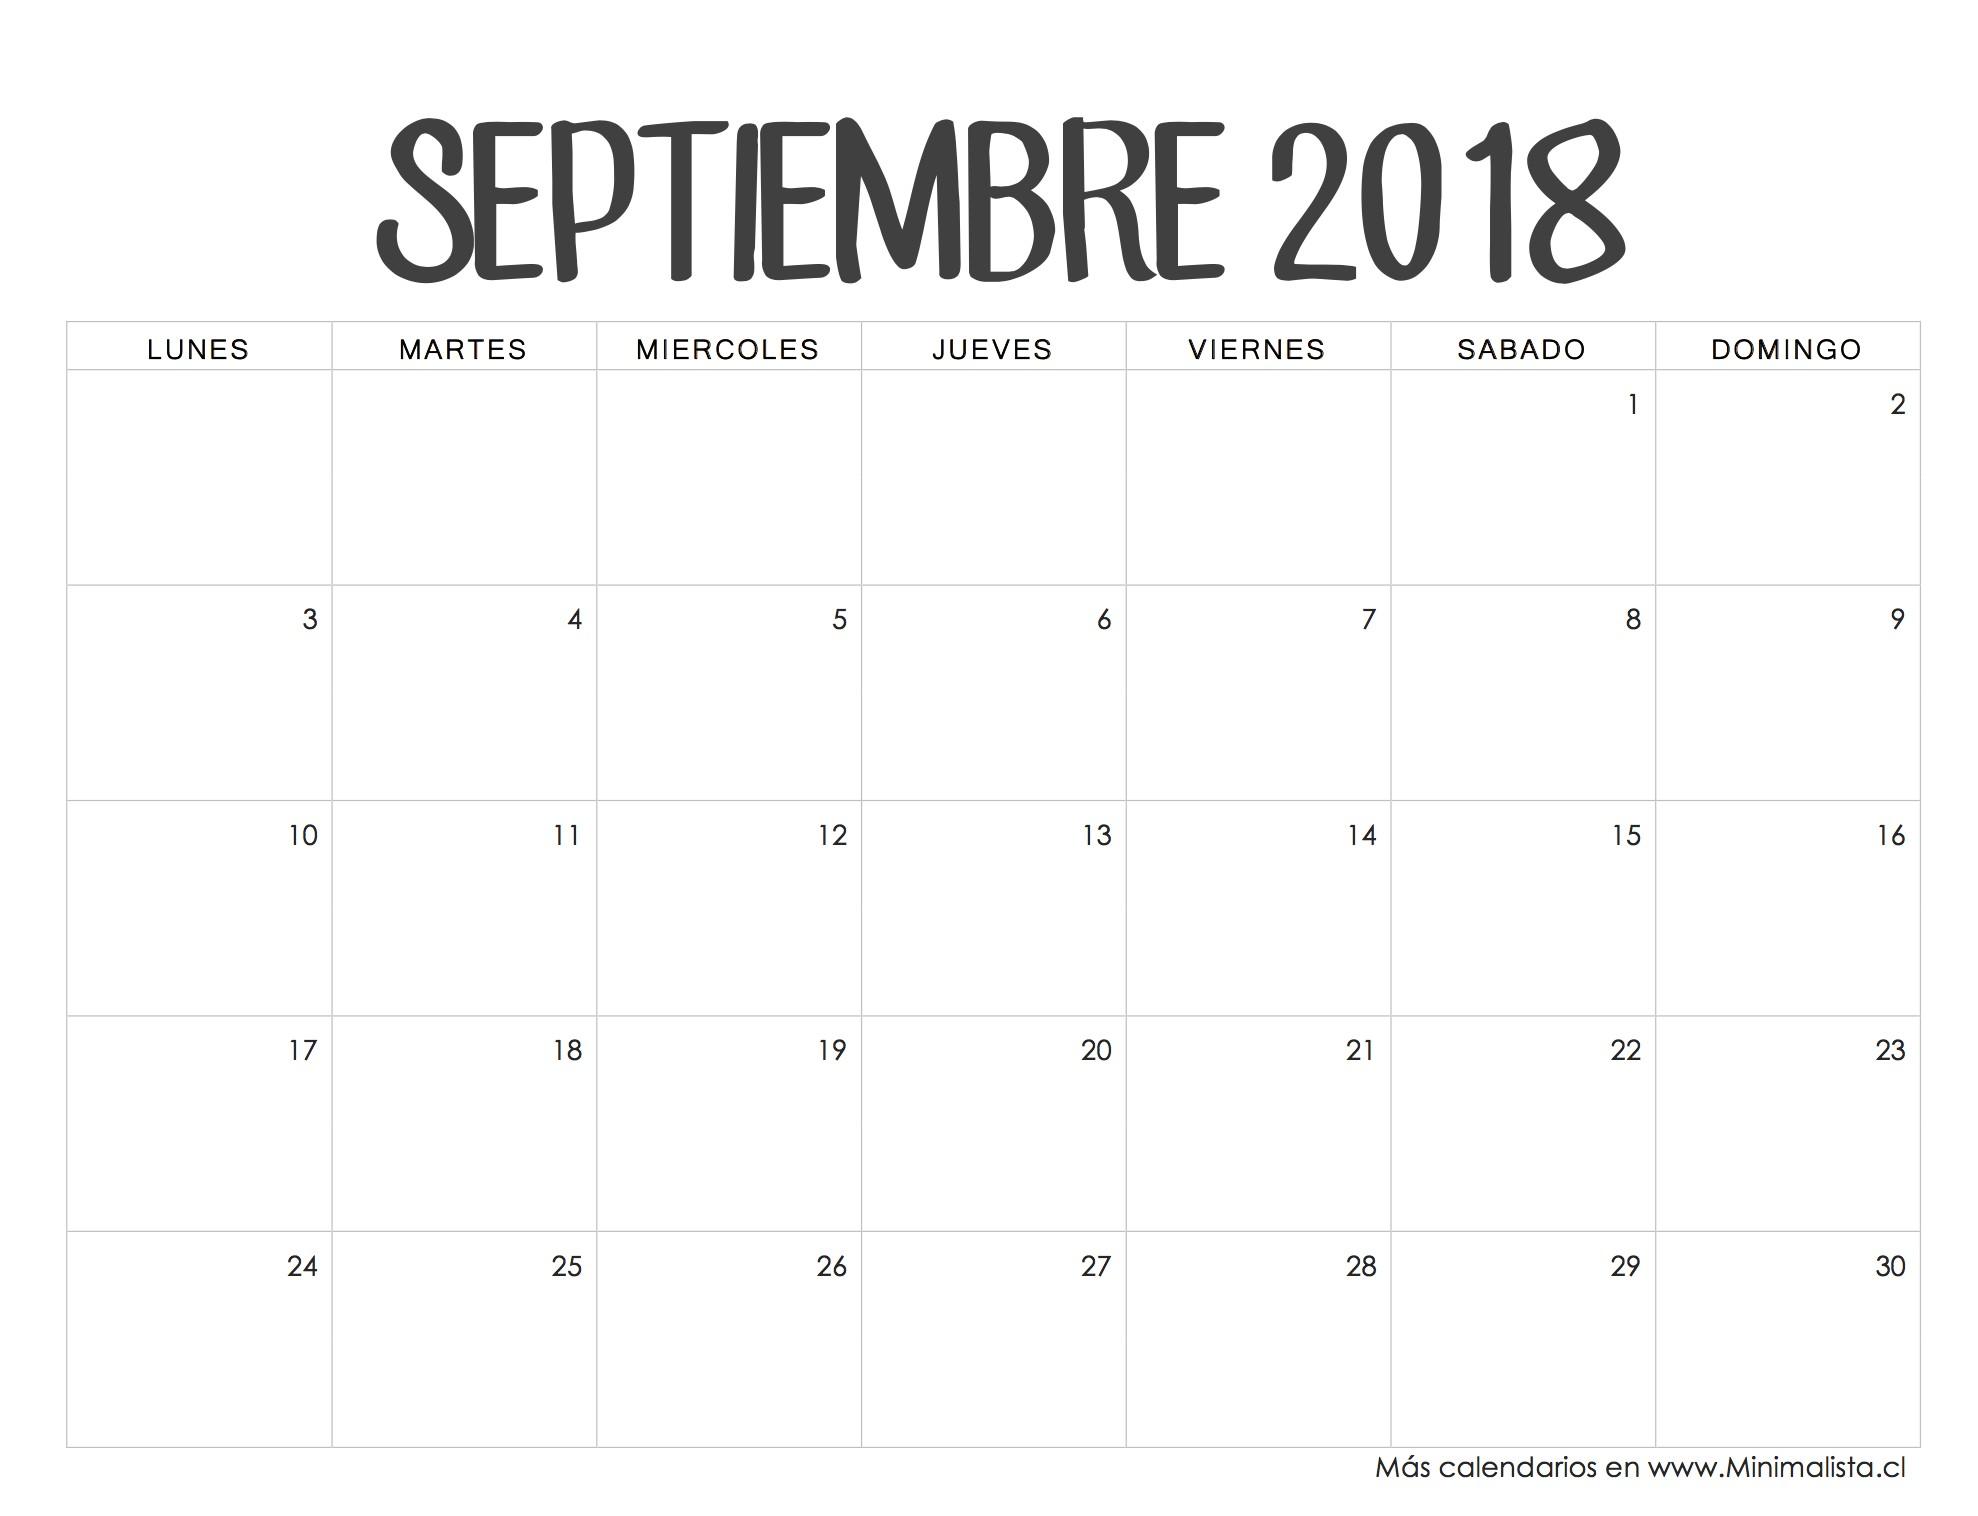 Calendario Chile 2019 Chile Actual Calendario Septiembre 2018 Ideas Para Mi Agenda Of Calendario Chile 2019 Chile Más Populares Nautical Free Free Nautical Charts & Publications No Image Version